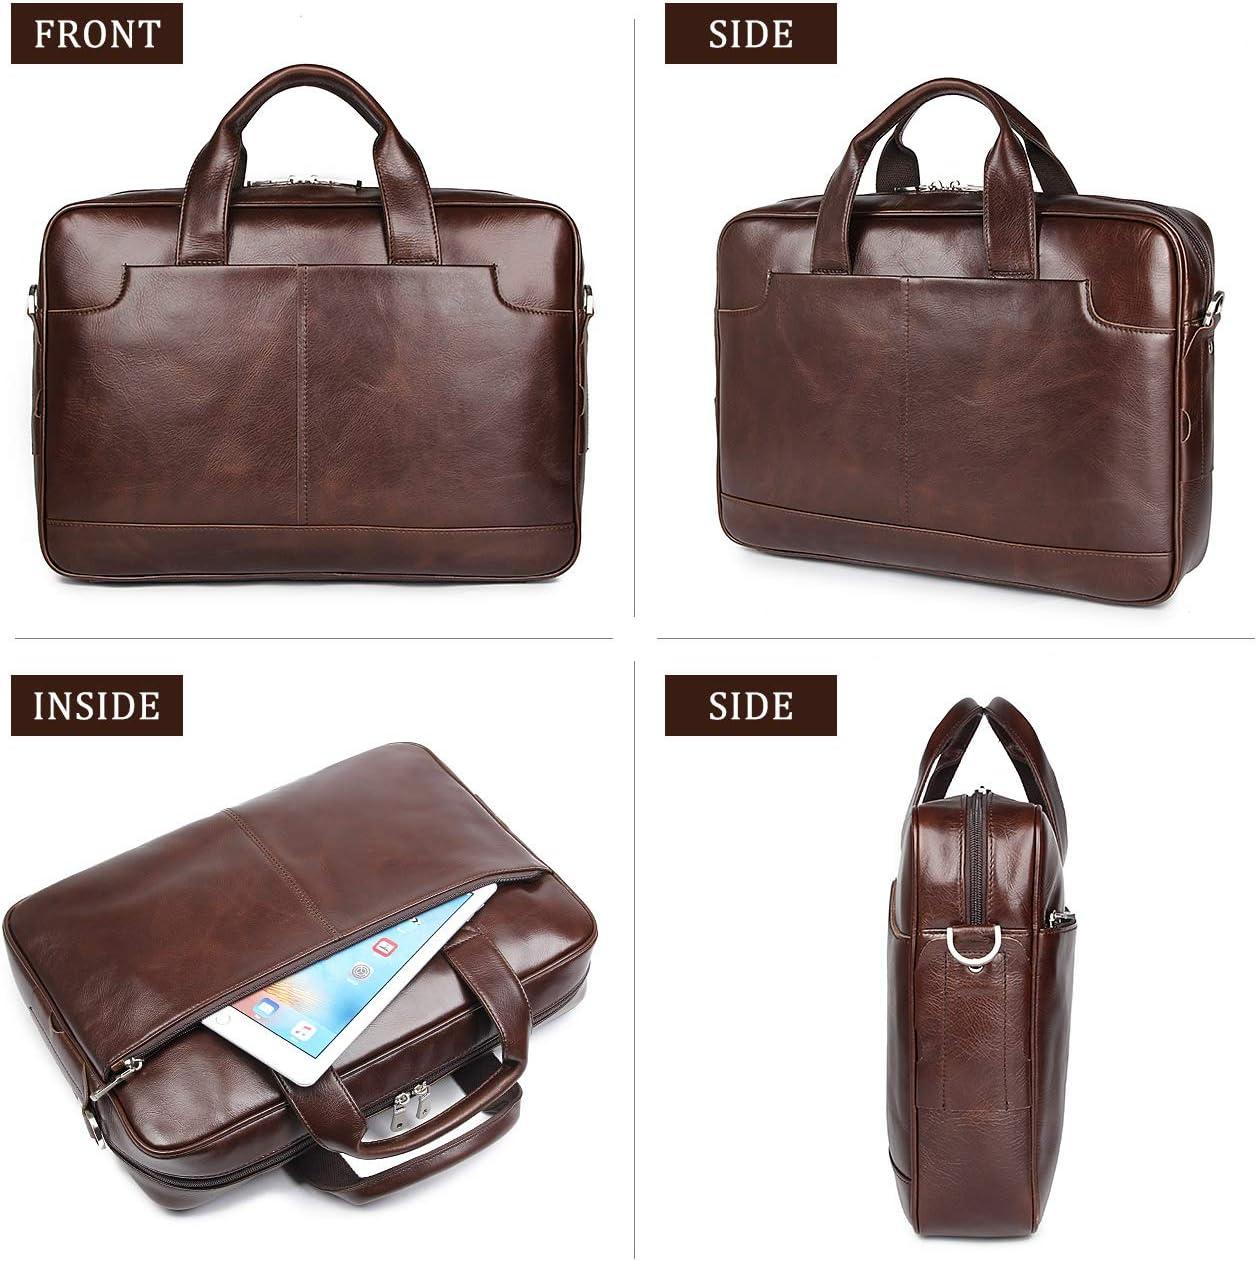 Augus Leather 16 Laptop Briefcase for Men Shoulder BagTravel Messenger Duffle Bags handbag With YKK Metal Zipper